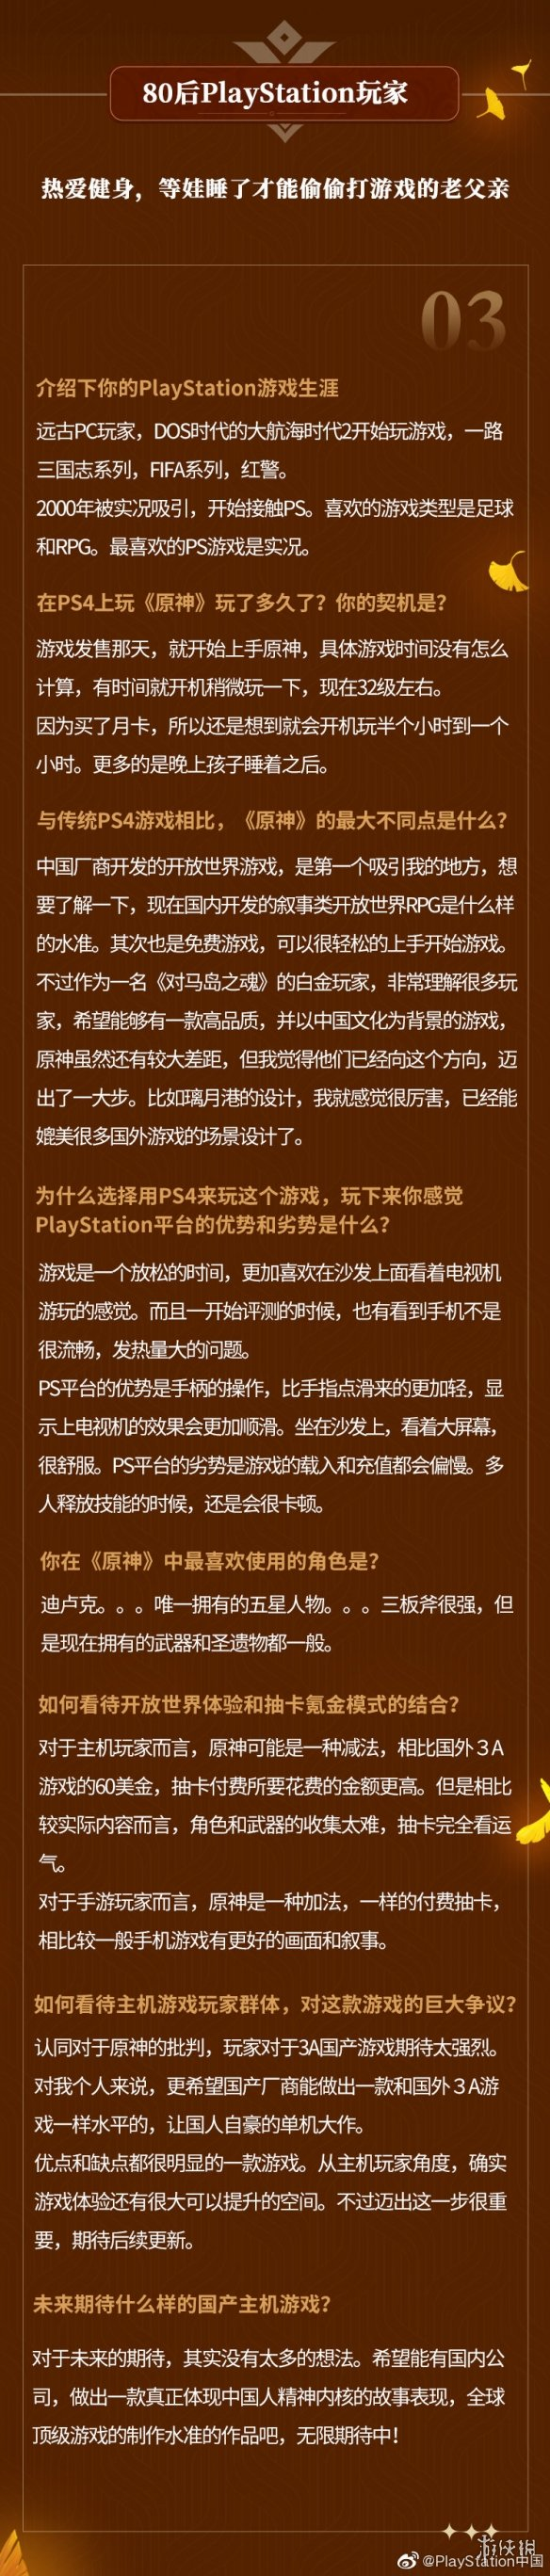 PlayStation中国分享80后、90后、00后对《原神》看法